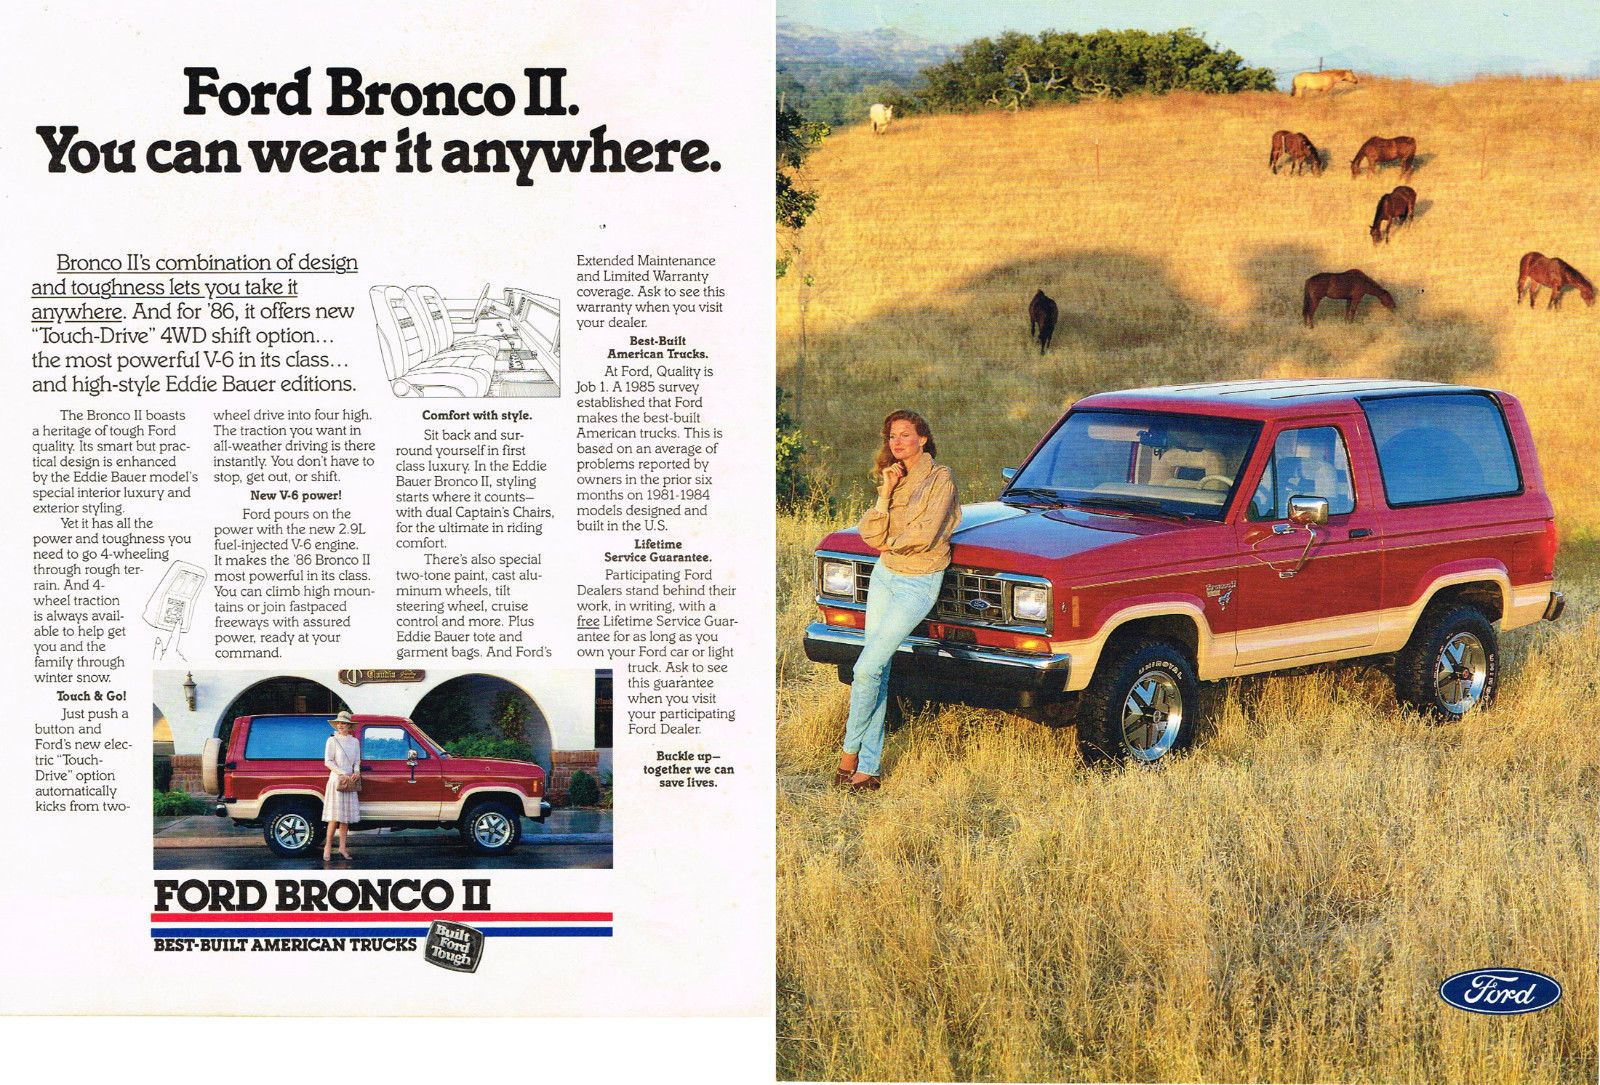 Vintage 1986 2 Page Magazine Ad For Ford Bronco Ii Vantage And Korbel Champagne Ford Bronco Ii Ford Bronco Bronco Ii